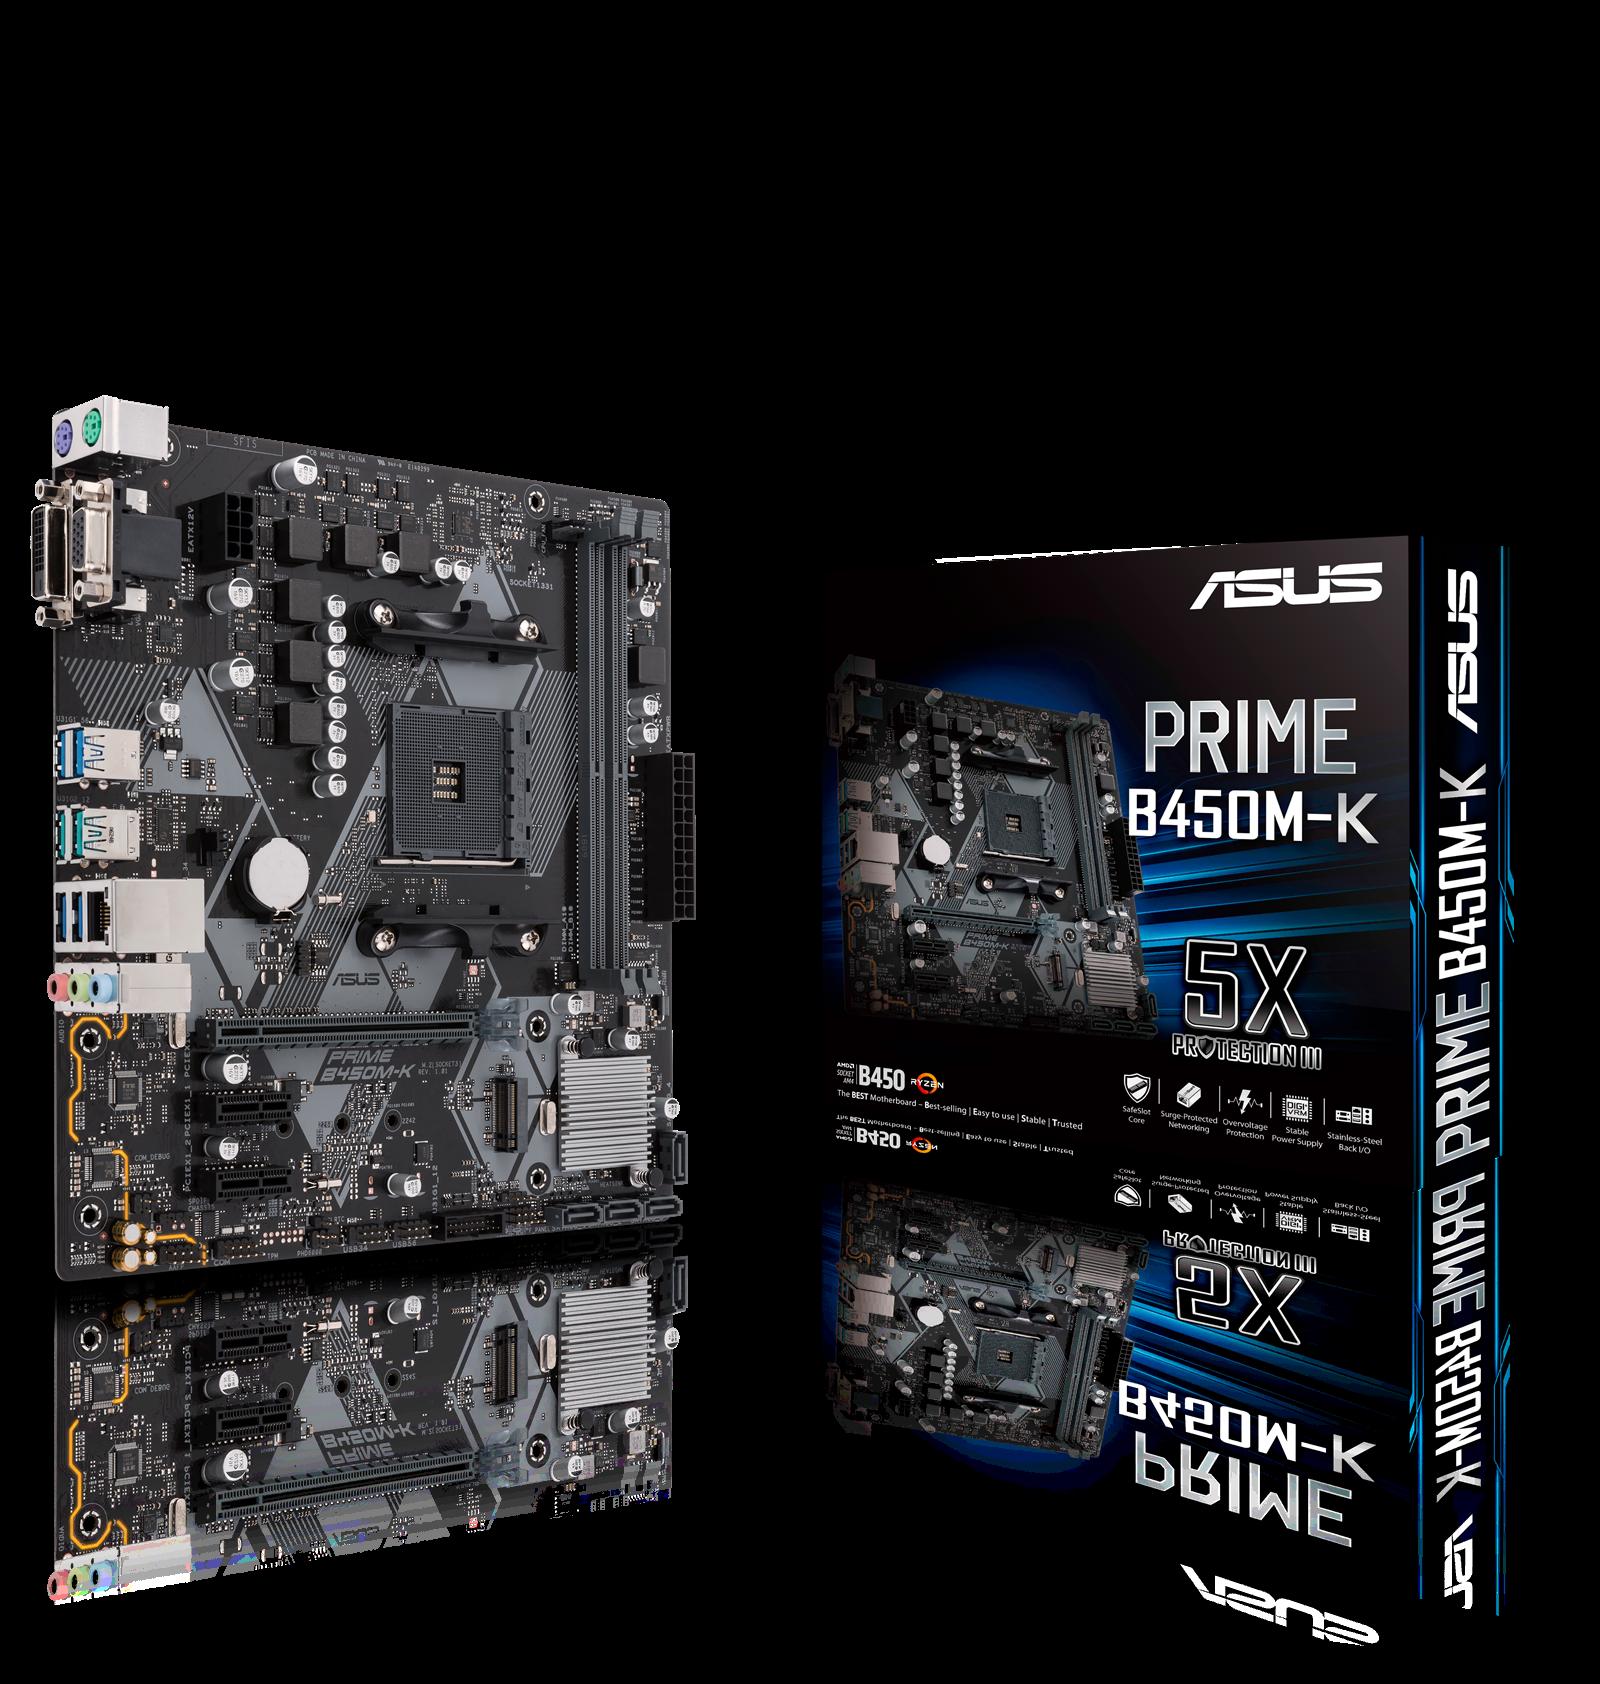 ASUS PRIME B450M K AMD Socket AM4 Motherboard